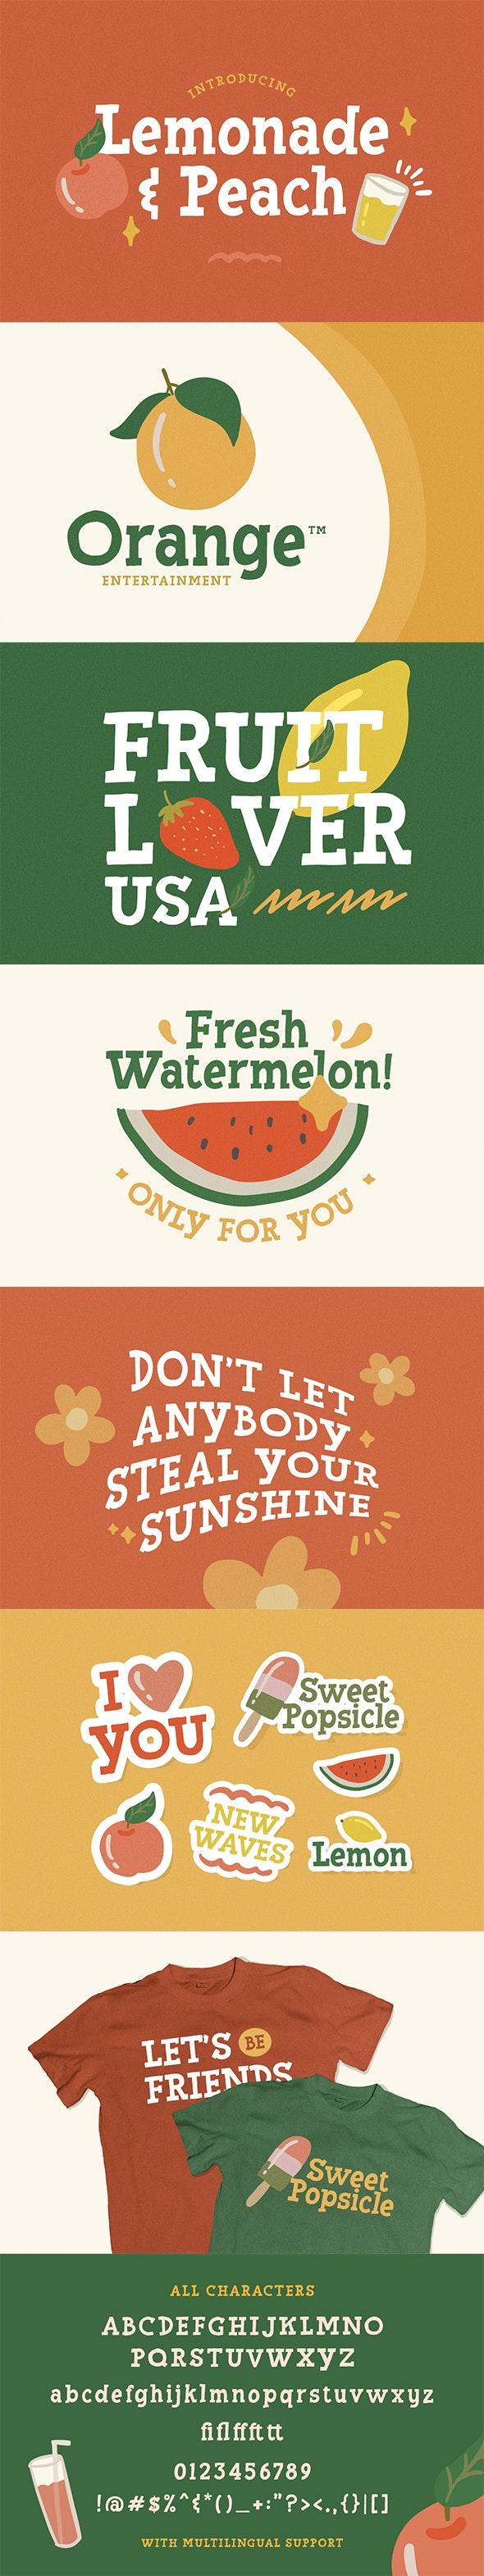 Lemonade and Peach - Display Font - Serif Fonts